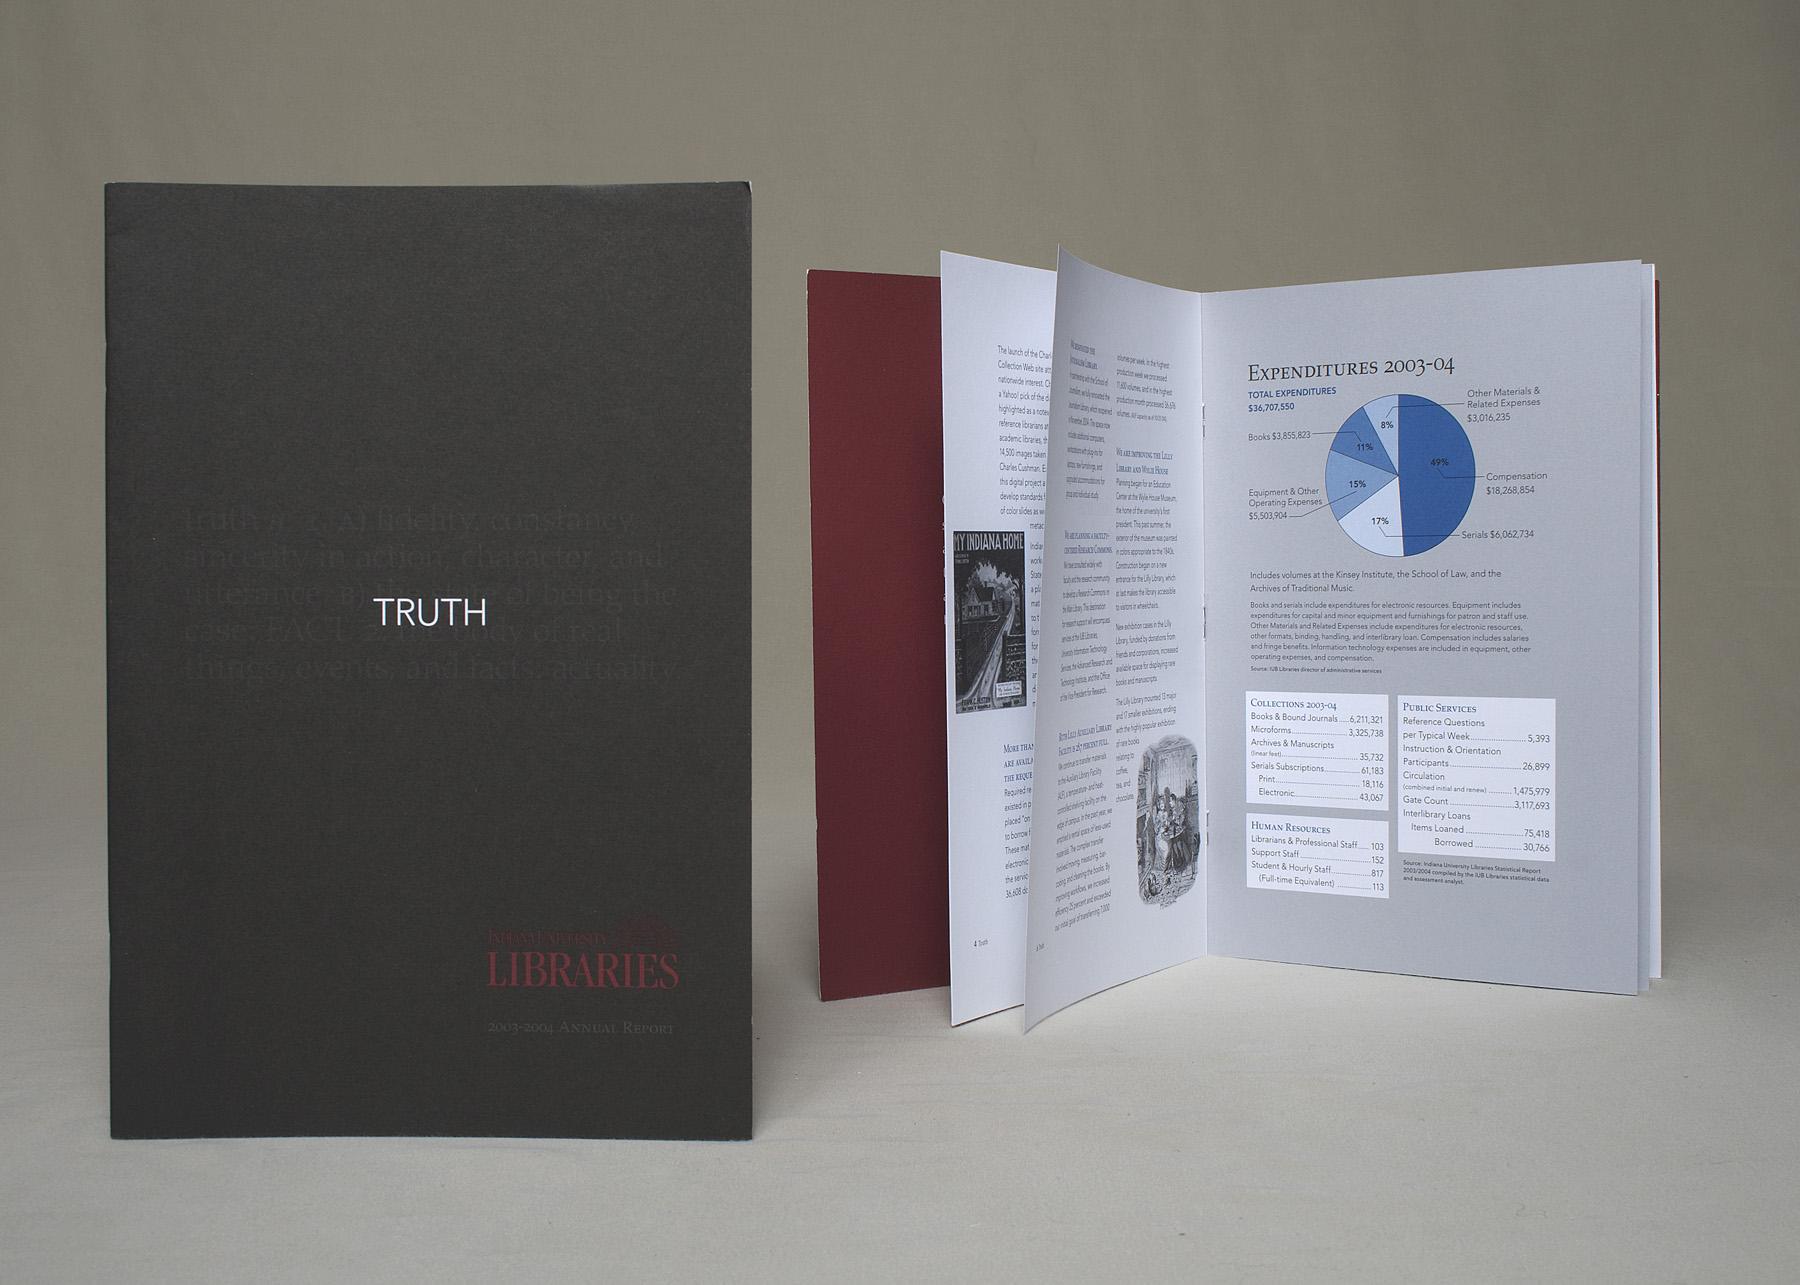 IUB LIBRARIES: Trust | Truth